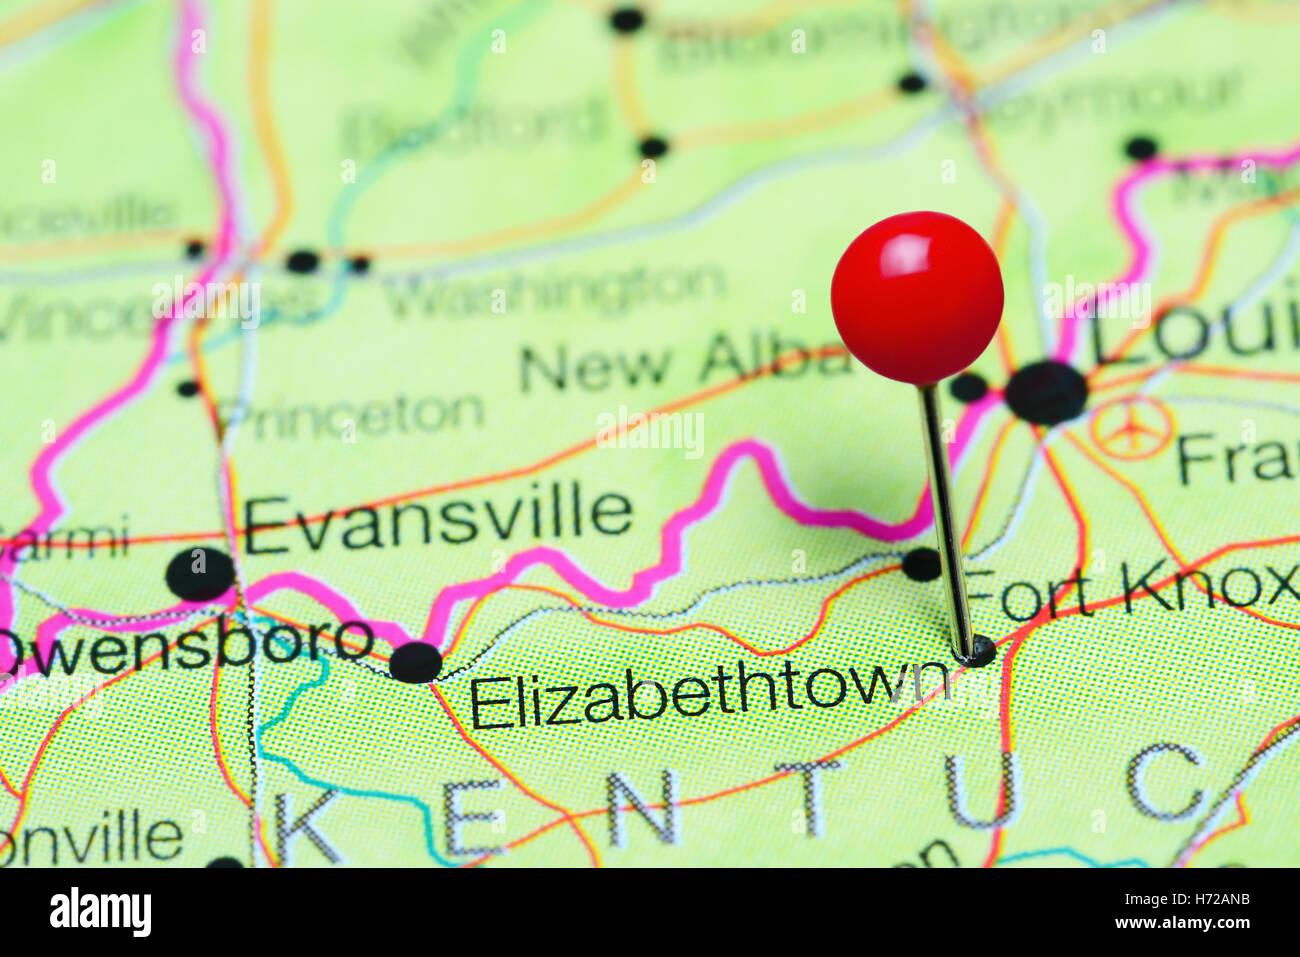 Elizabethtown pinned on a map of Kentucky USA Stock Photo Royalty